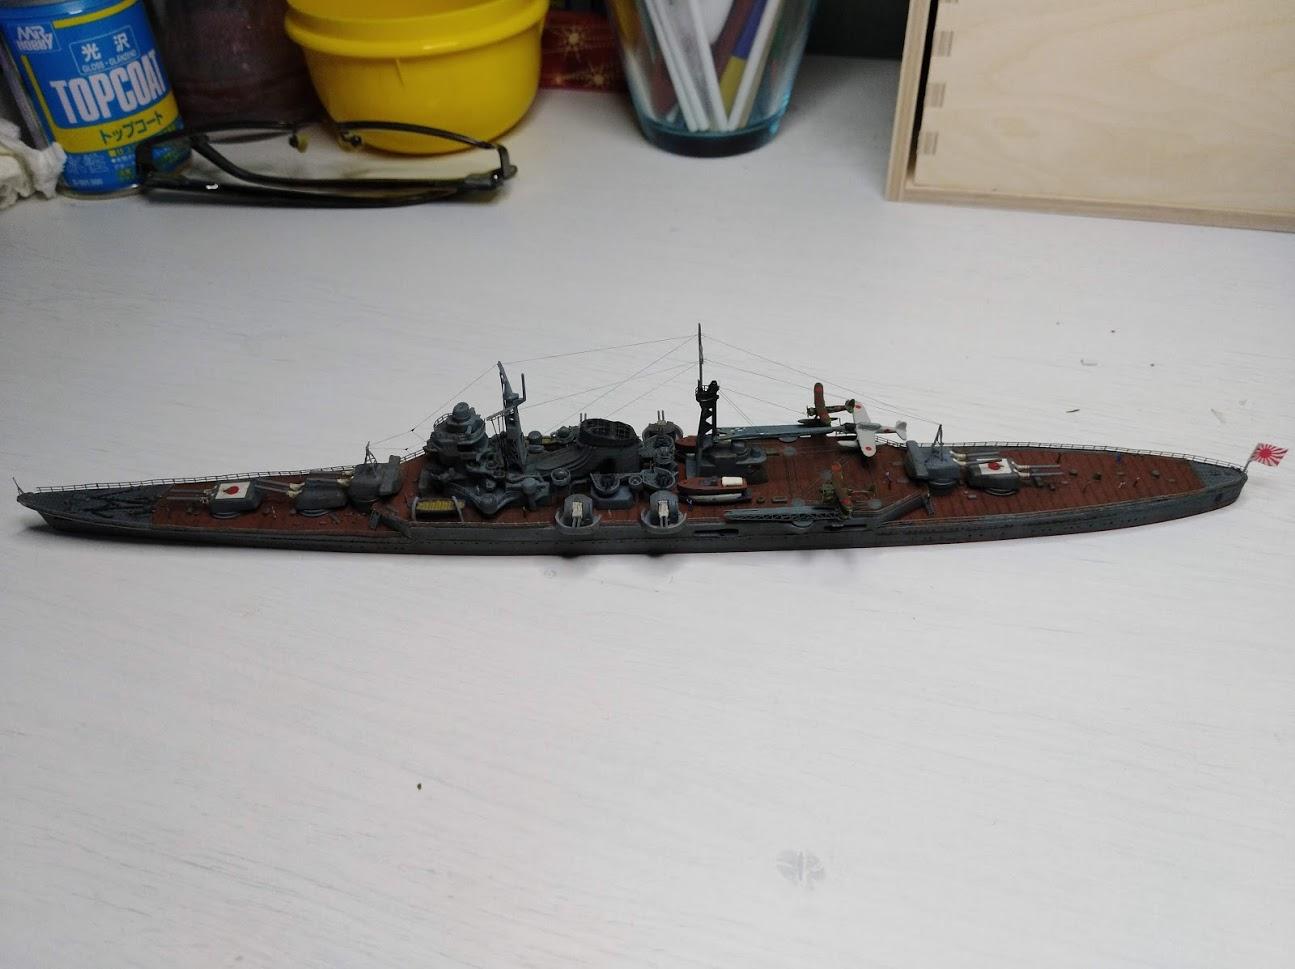 Croiseur Mikuma au 1/700 de chez Tamiya - Page 2 Img_2043